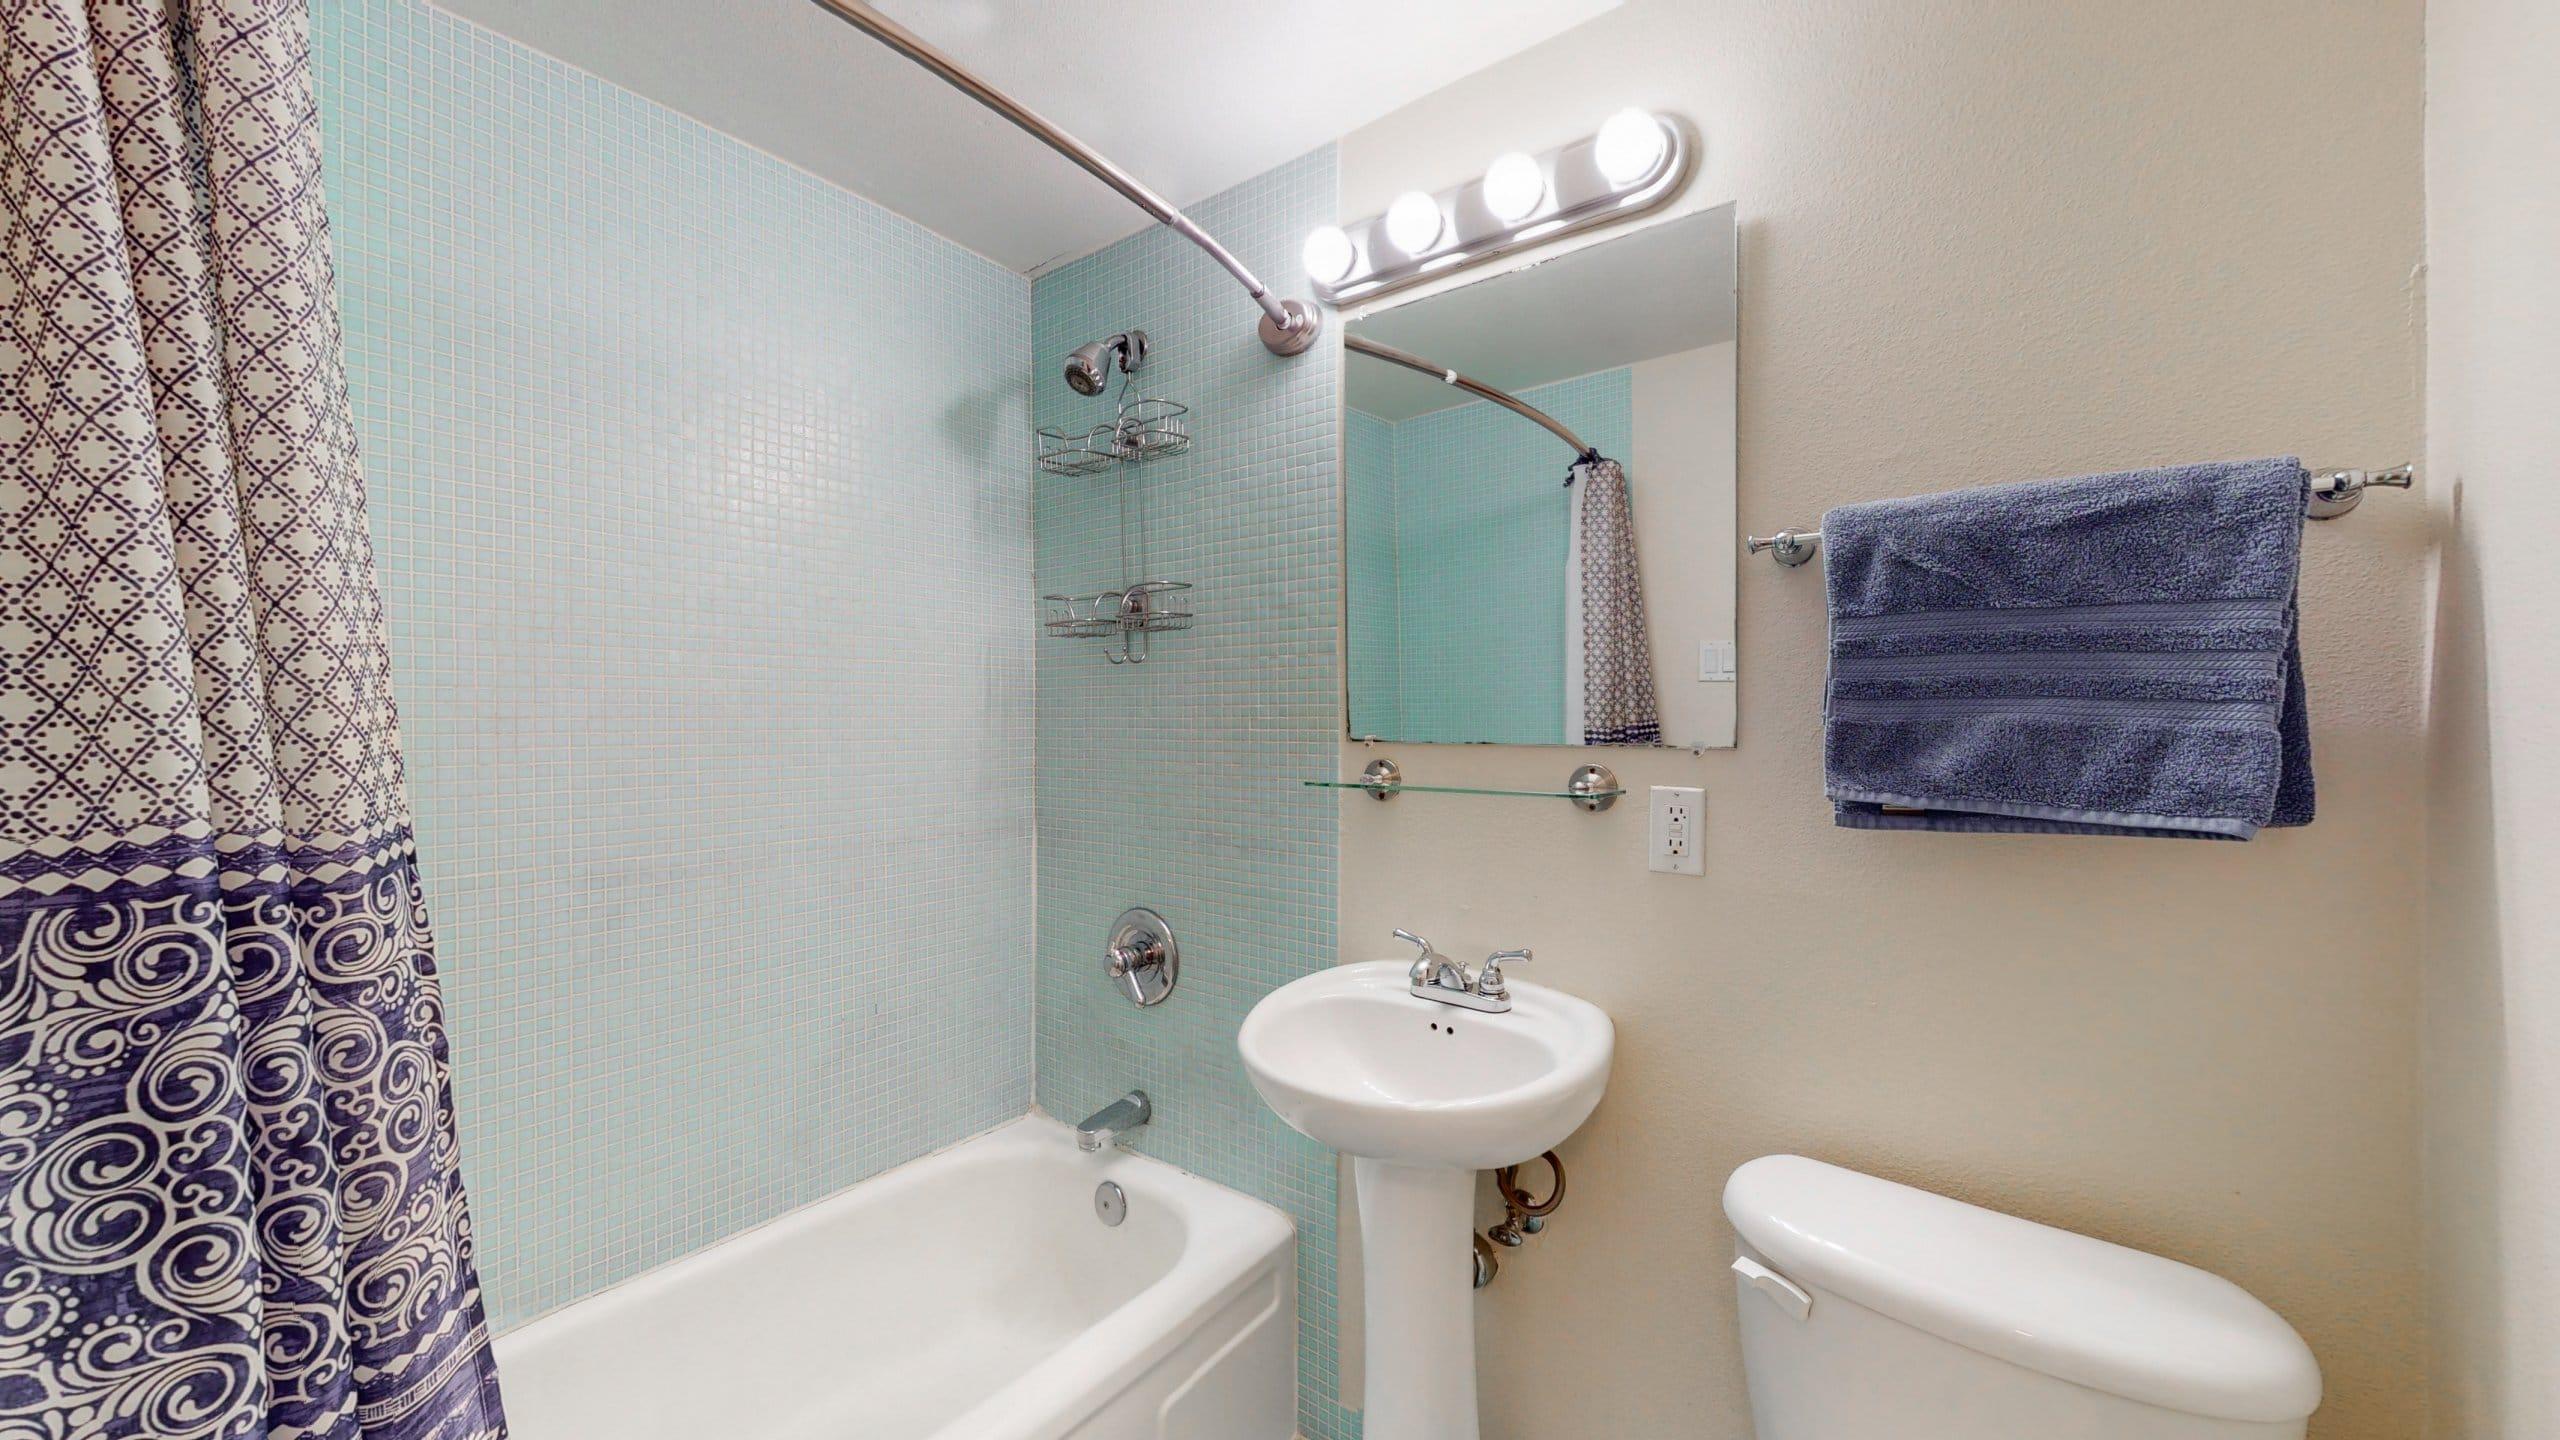 Congress Park Condo For Sale Master Bathroom